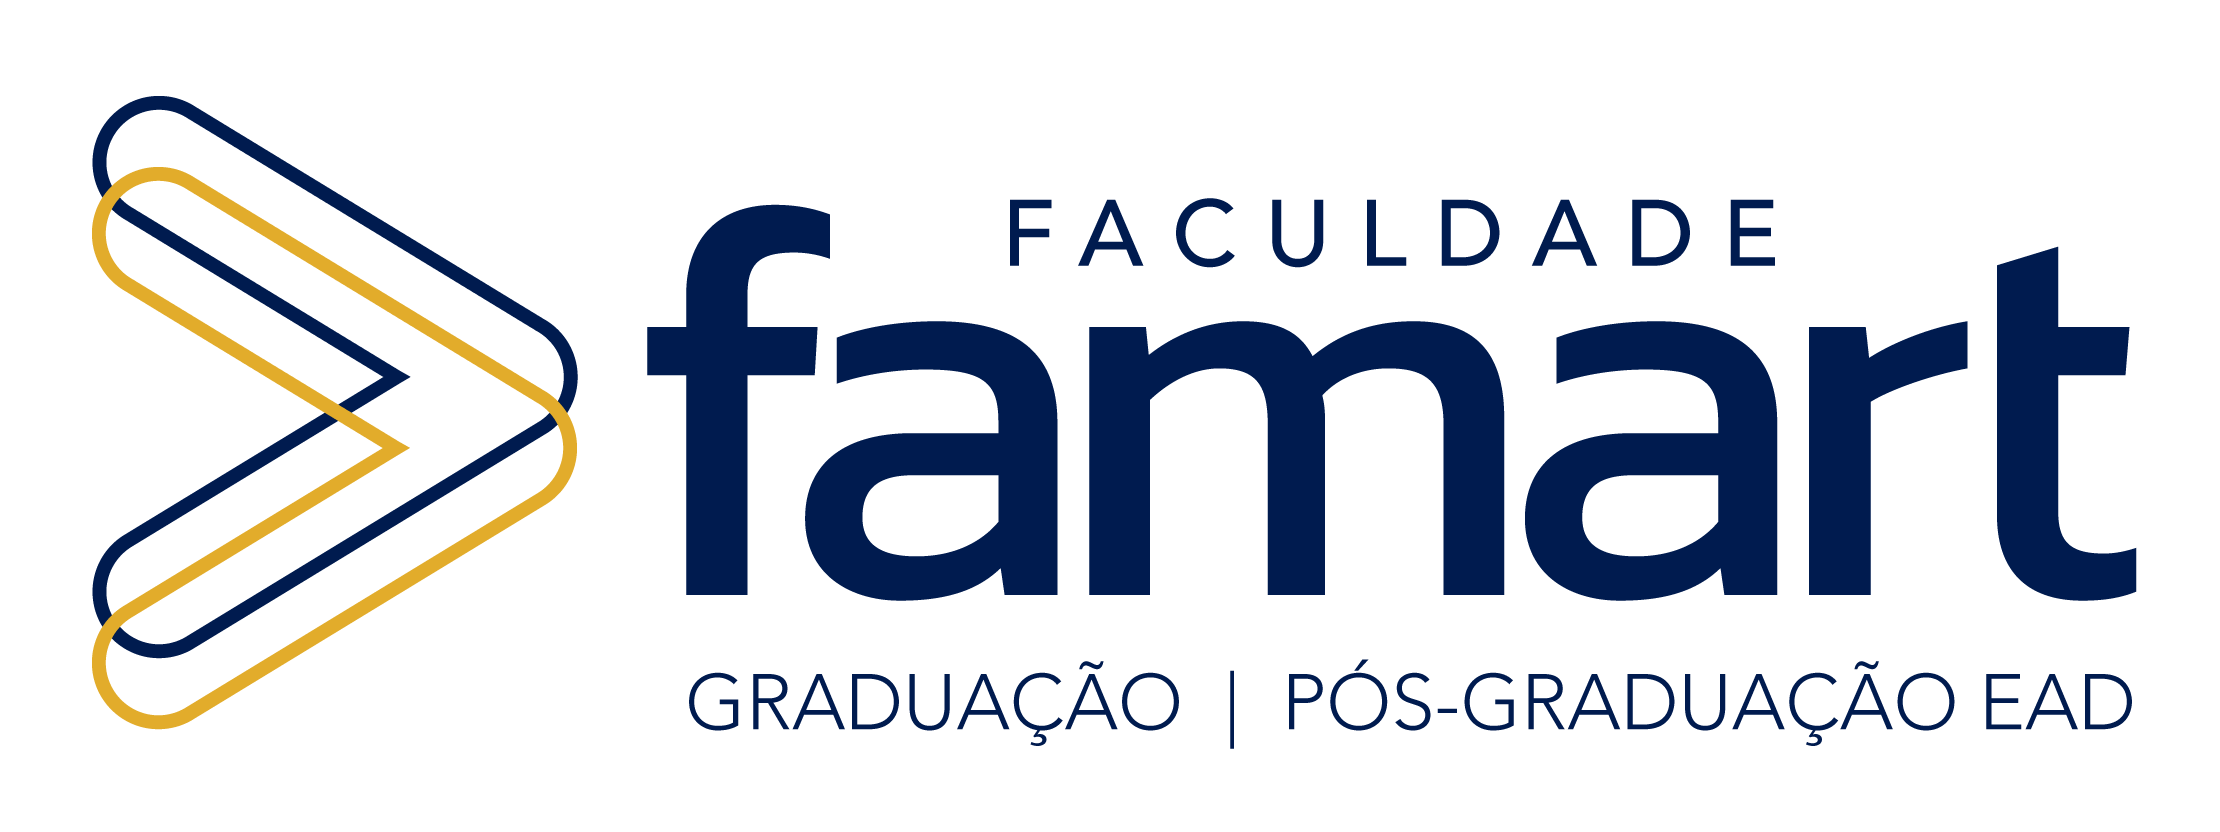 Faculdade Famart